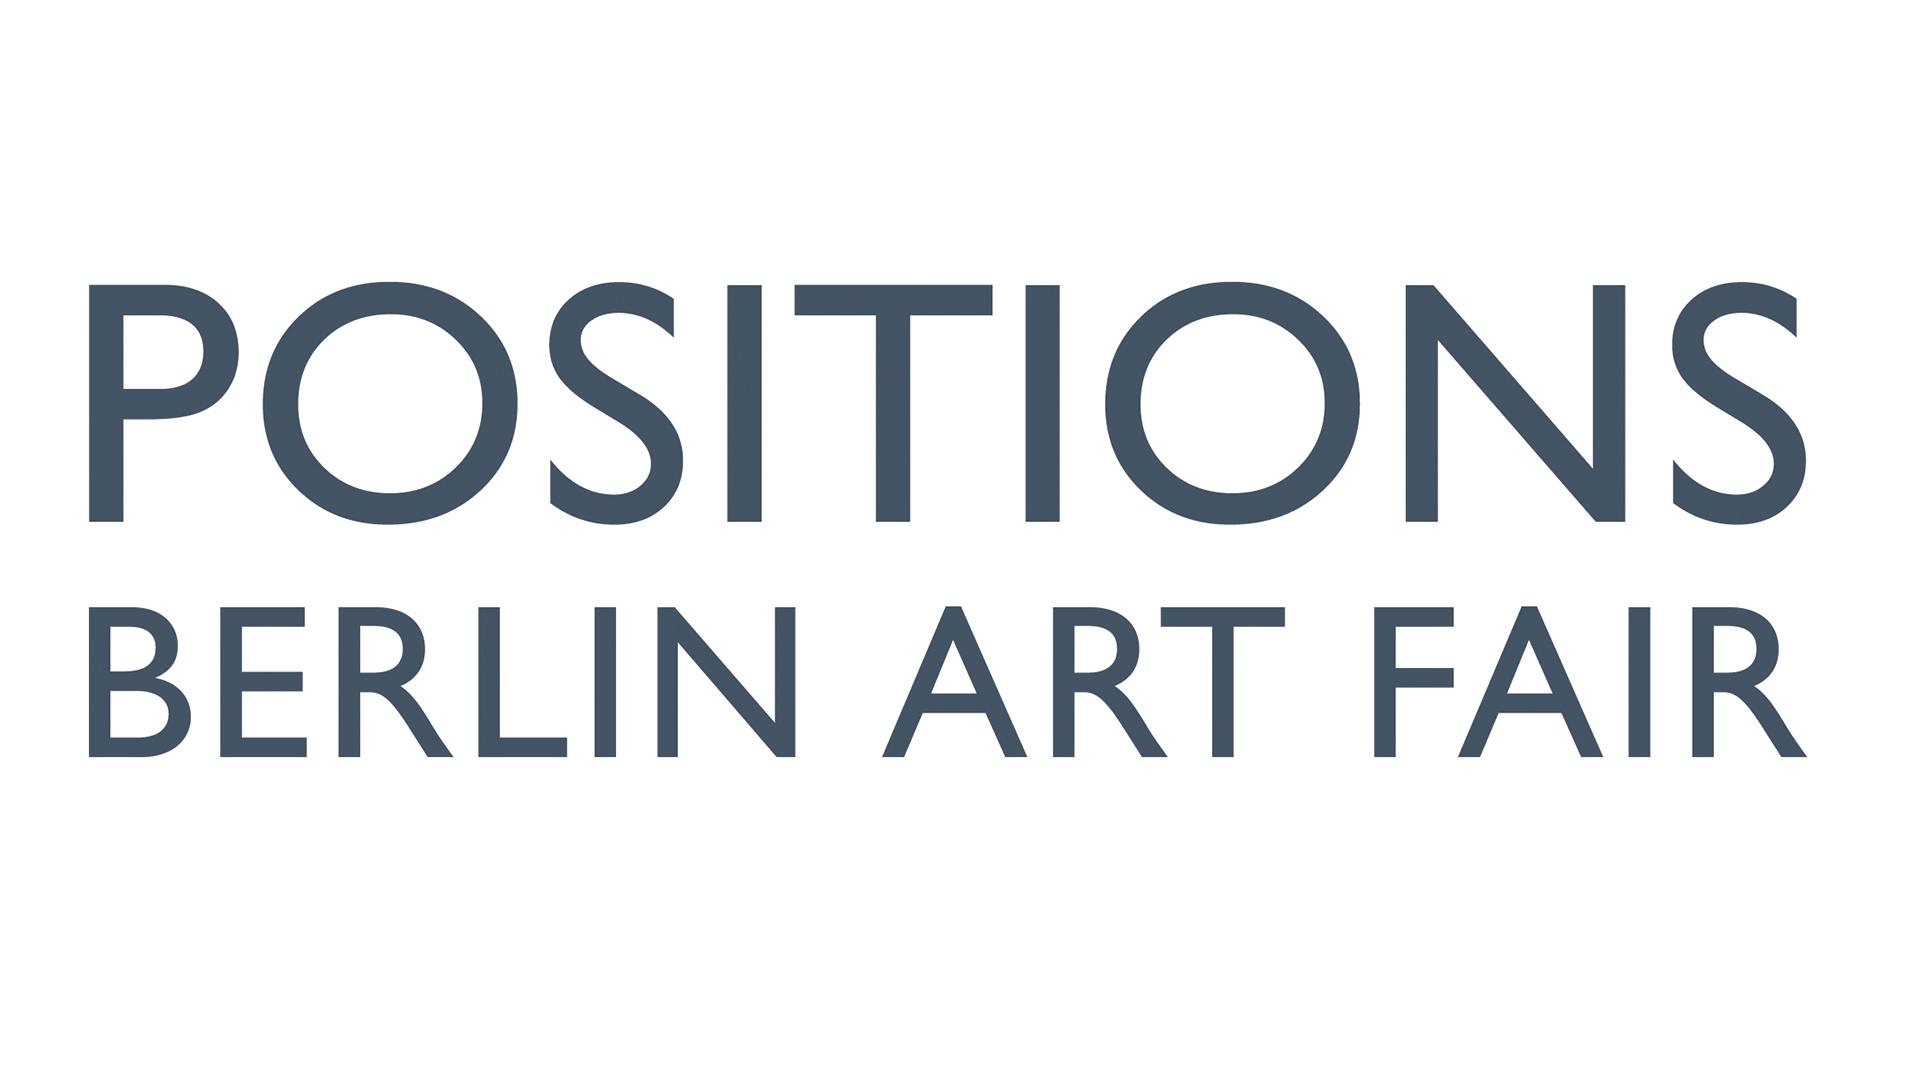 PositionsLogoFB.jpg